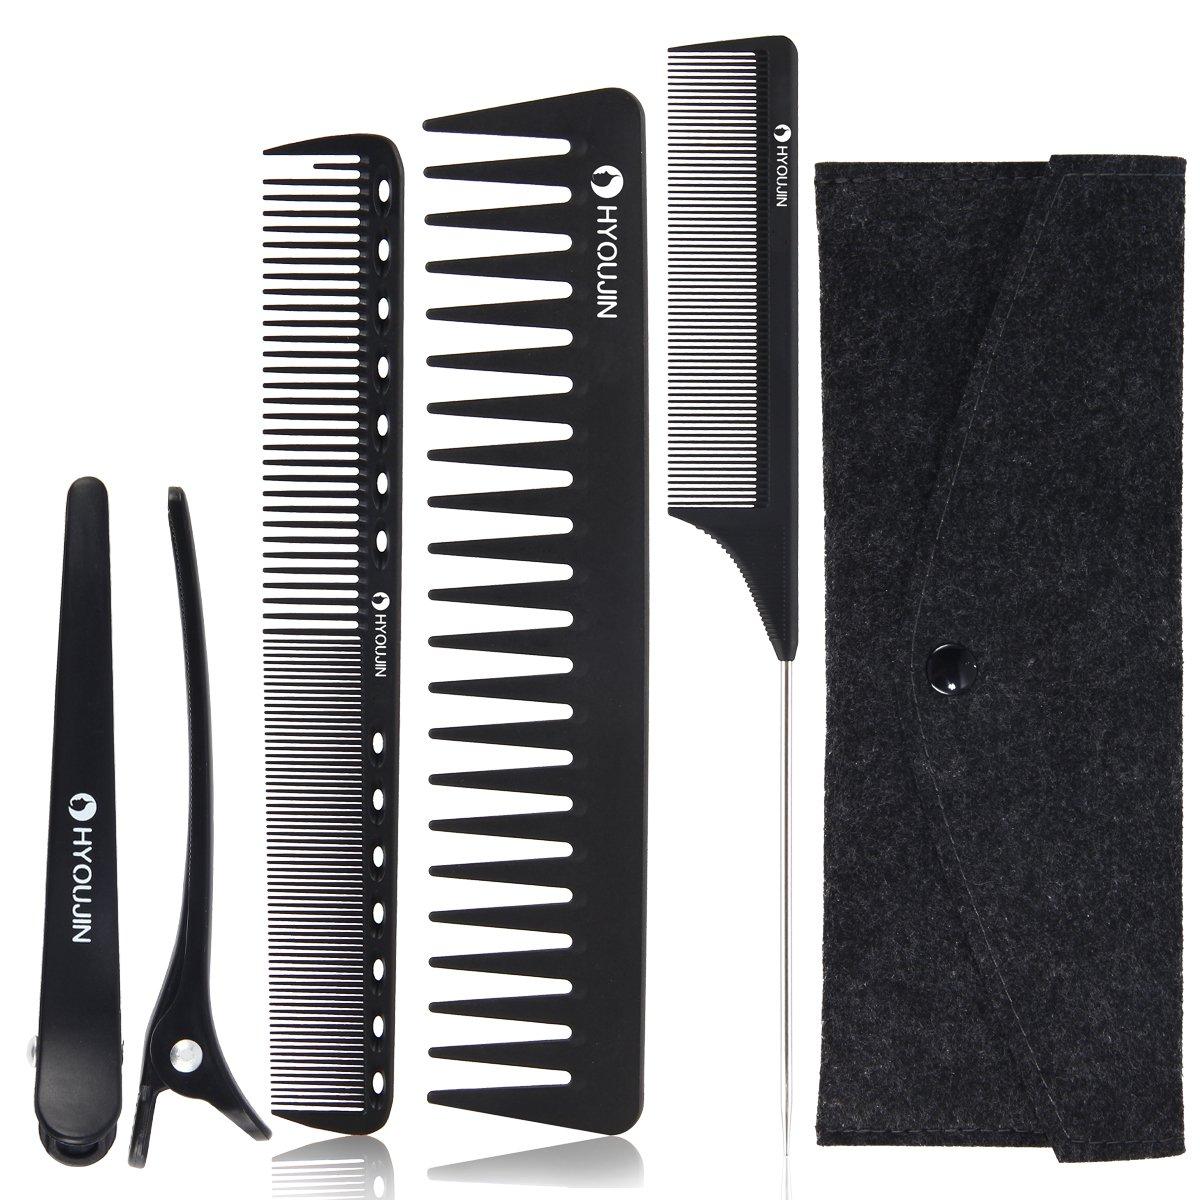 HYOUJIN Black Carbon Professional Styling Comb Set with Clips Hairdresser Barber Comb Set 5pcs